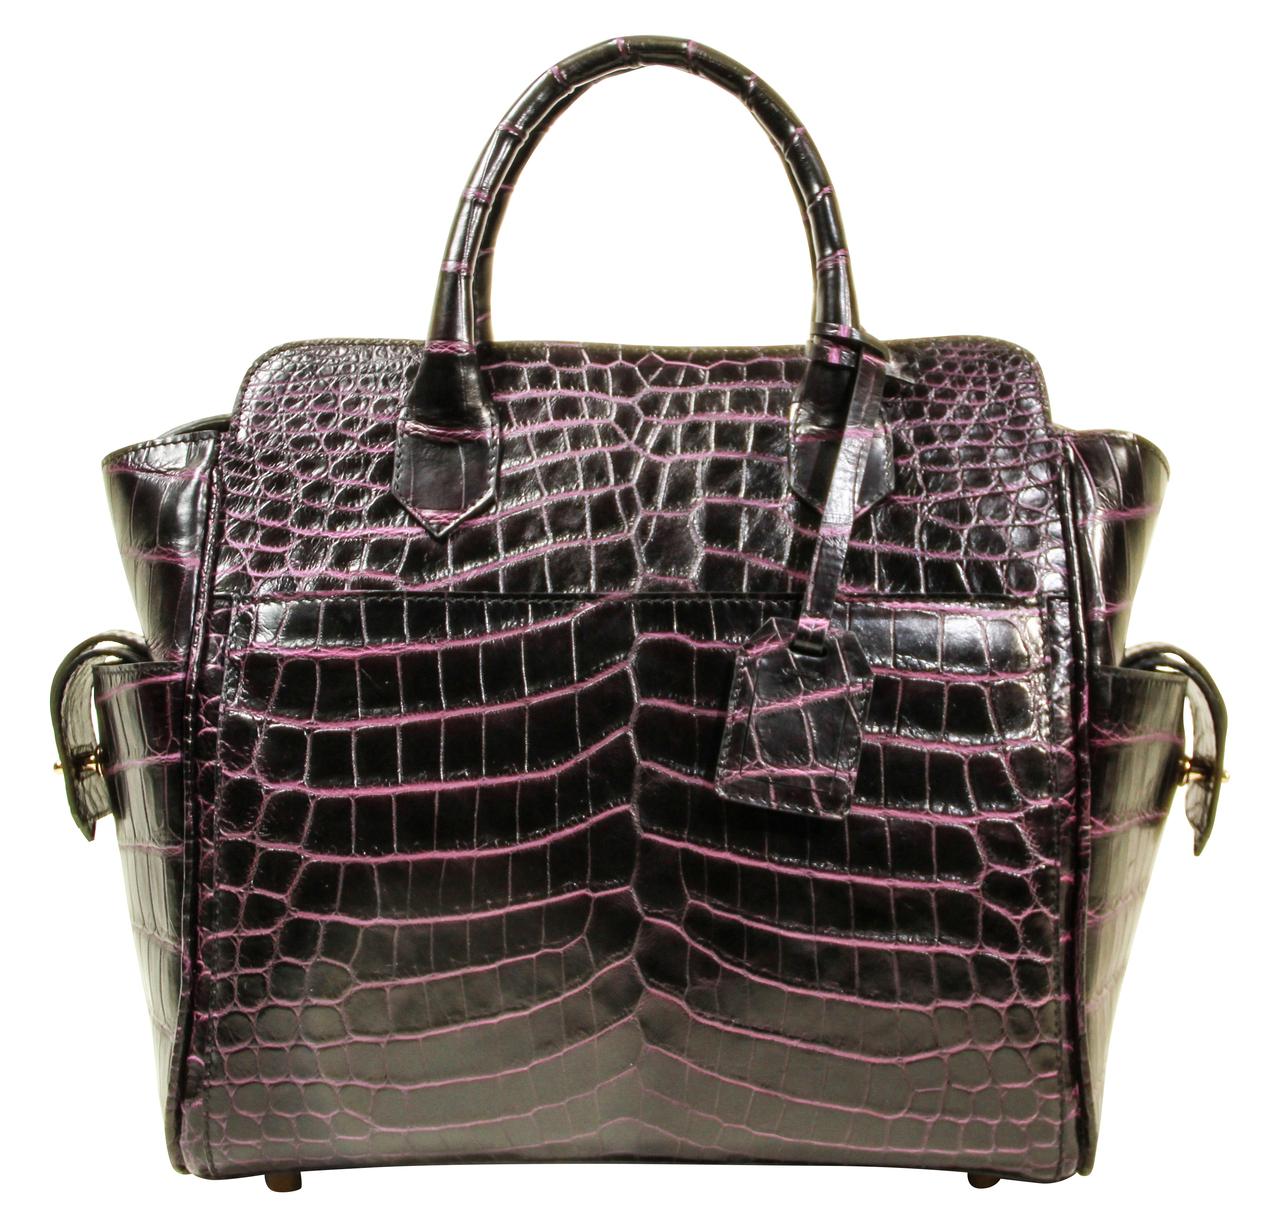 Trapeze Leveler - Nile Crocodile Satchel Bag - Two Tone Purple